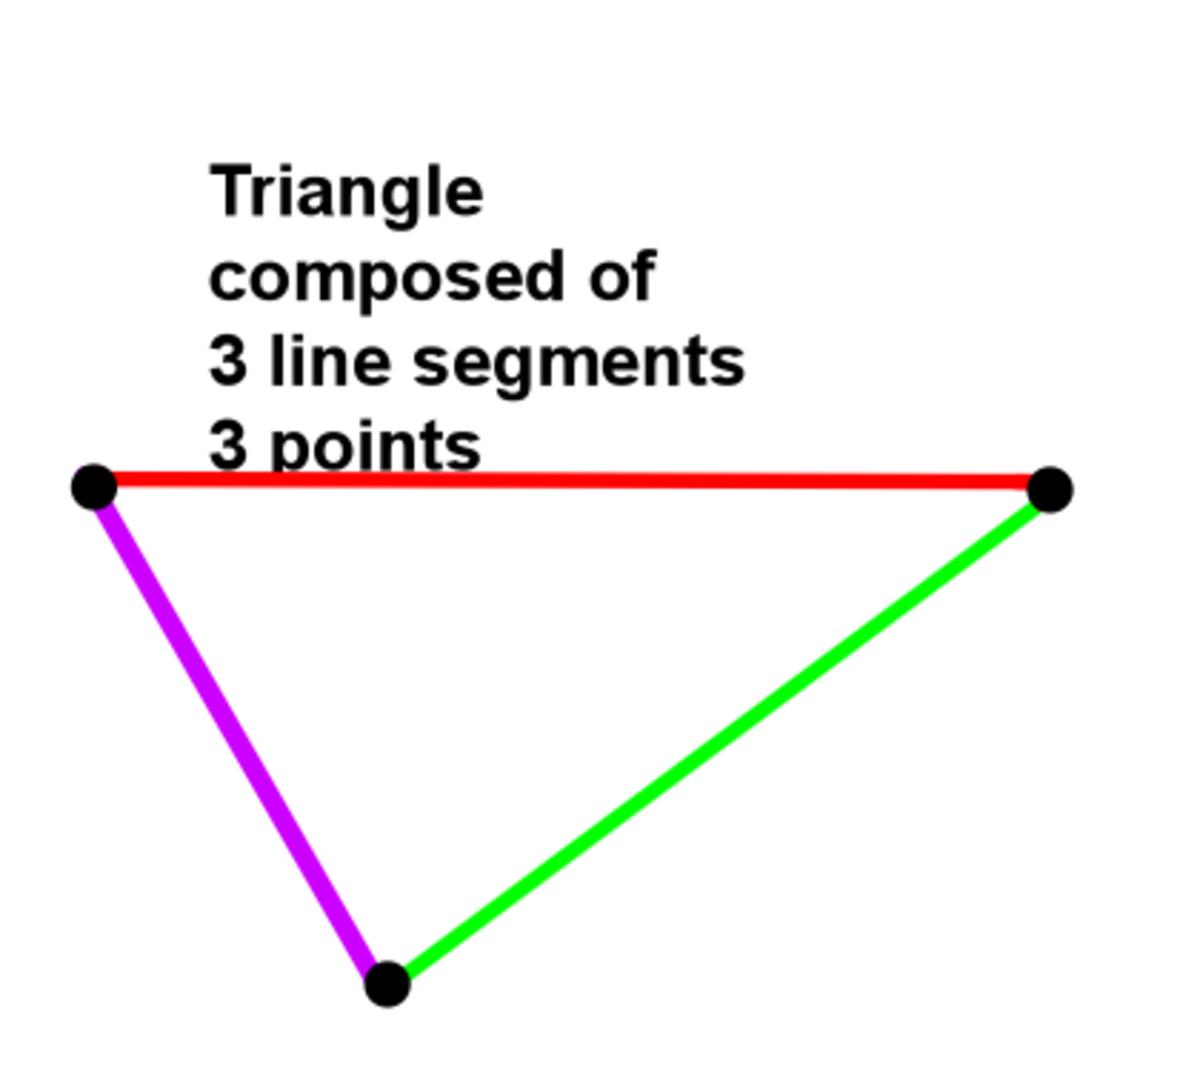 How those elements can create a new geometric figure